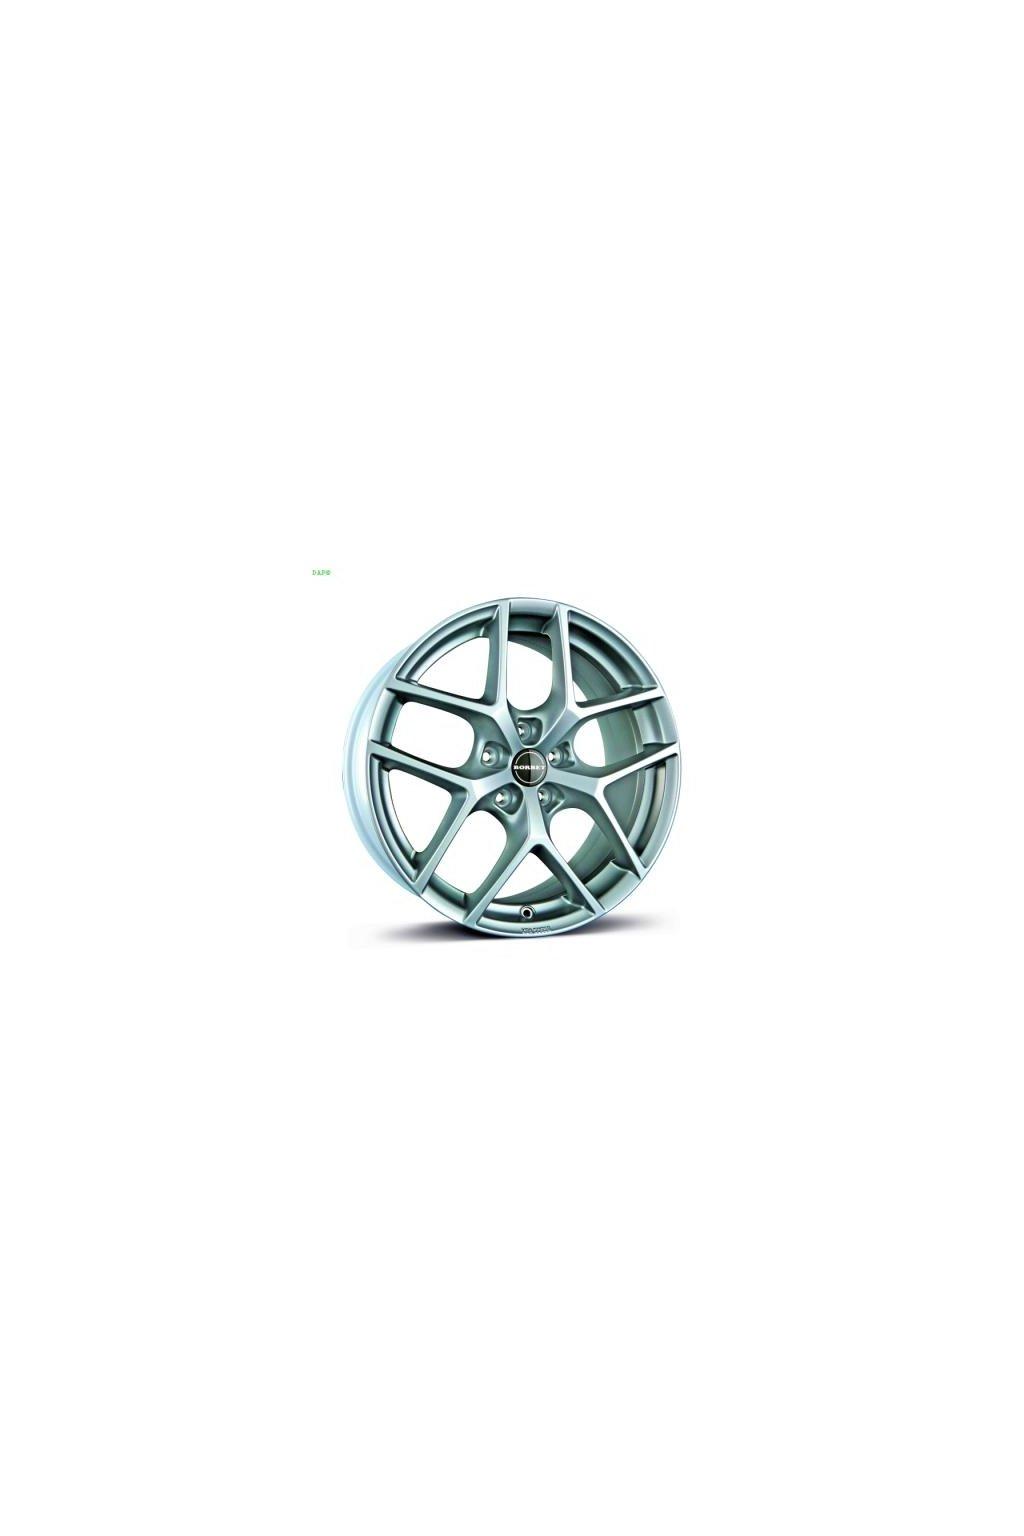 Disk Borbet Y 7.5x17 ET37 5x112 kristalovo strieborny